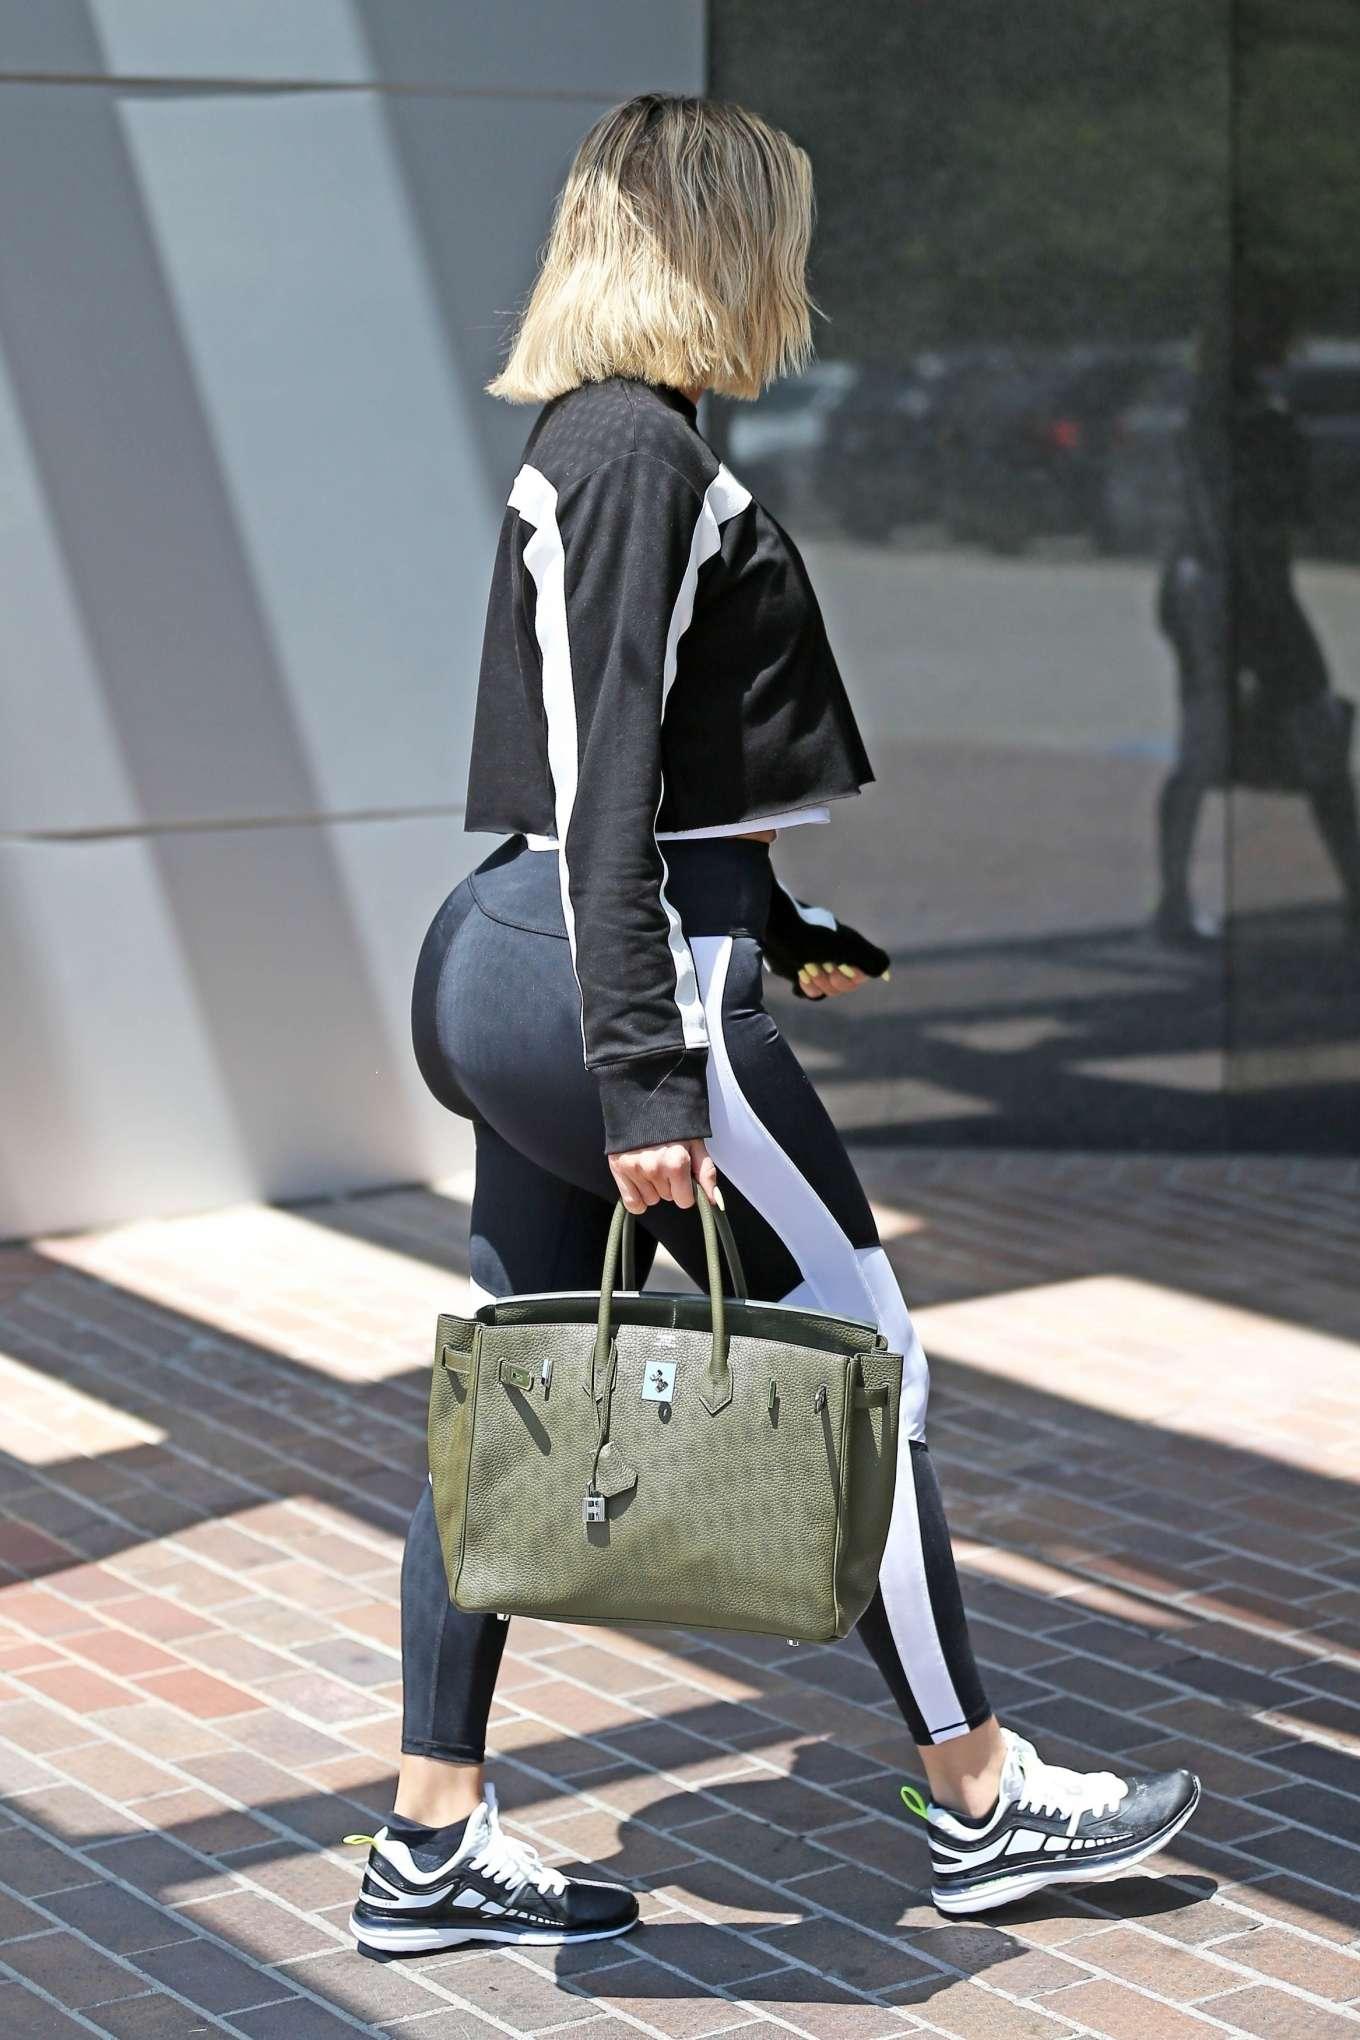 Khloe Kardashian - Hits the gym in Los Angeles